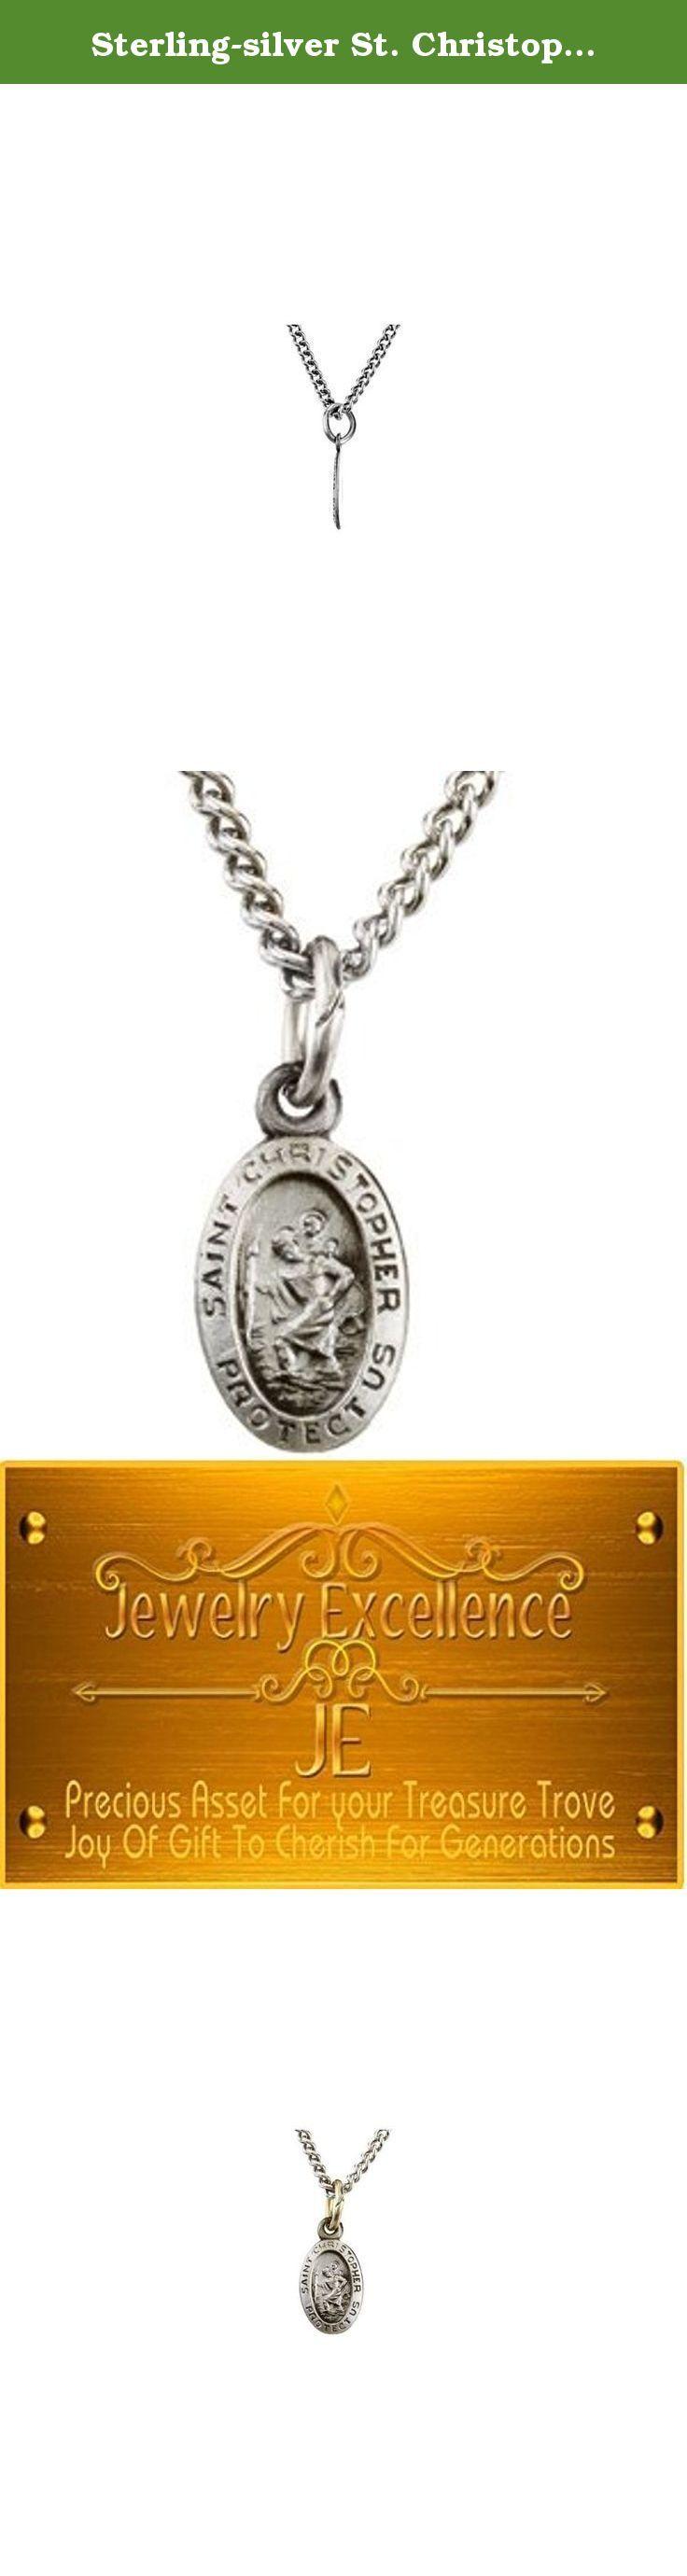 Sterling-silver St. Christopher Medal. Sterling Silver 12.25x8.75mm Oval St. Christopher 18 Necklace; QUALITY: Sterling Silver; PRODUCT: Necklace; JEWELRY STATE: N/A Min Wt: 0.26 grams;.